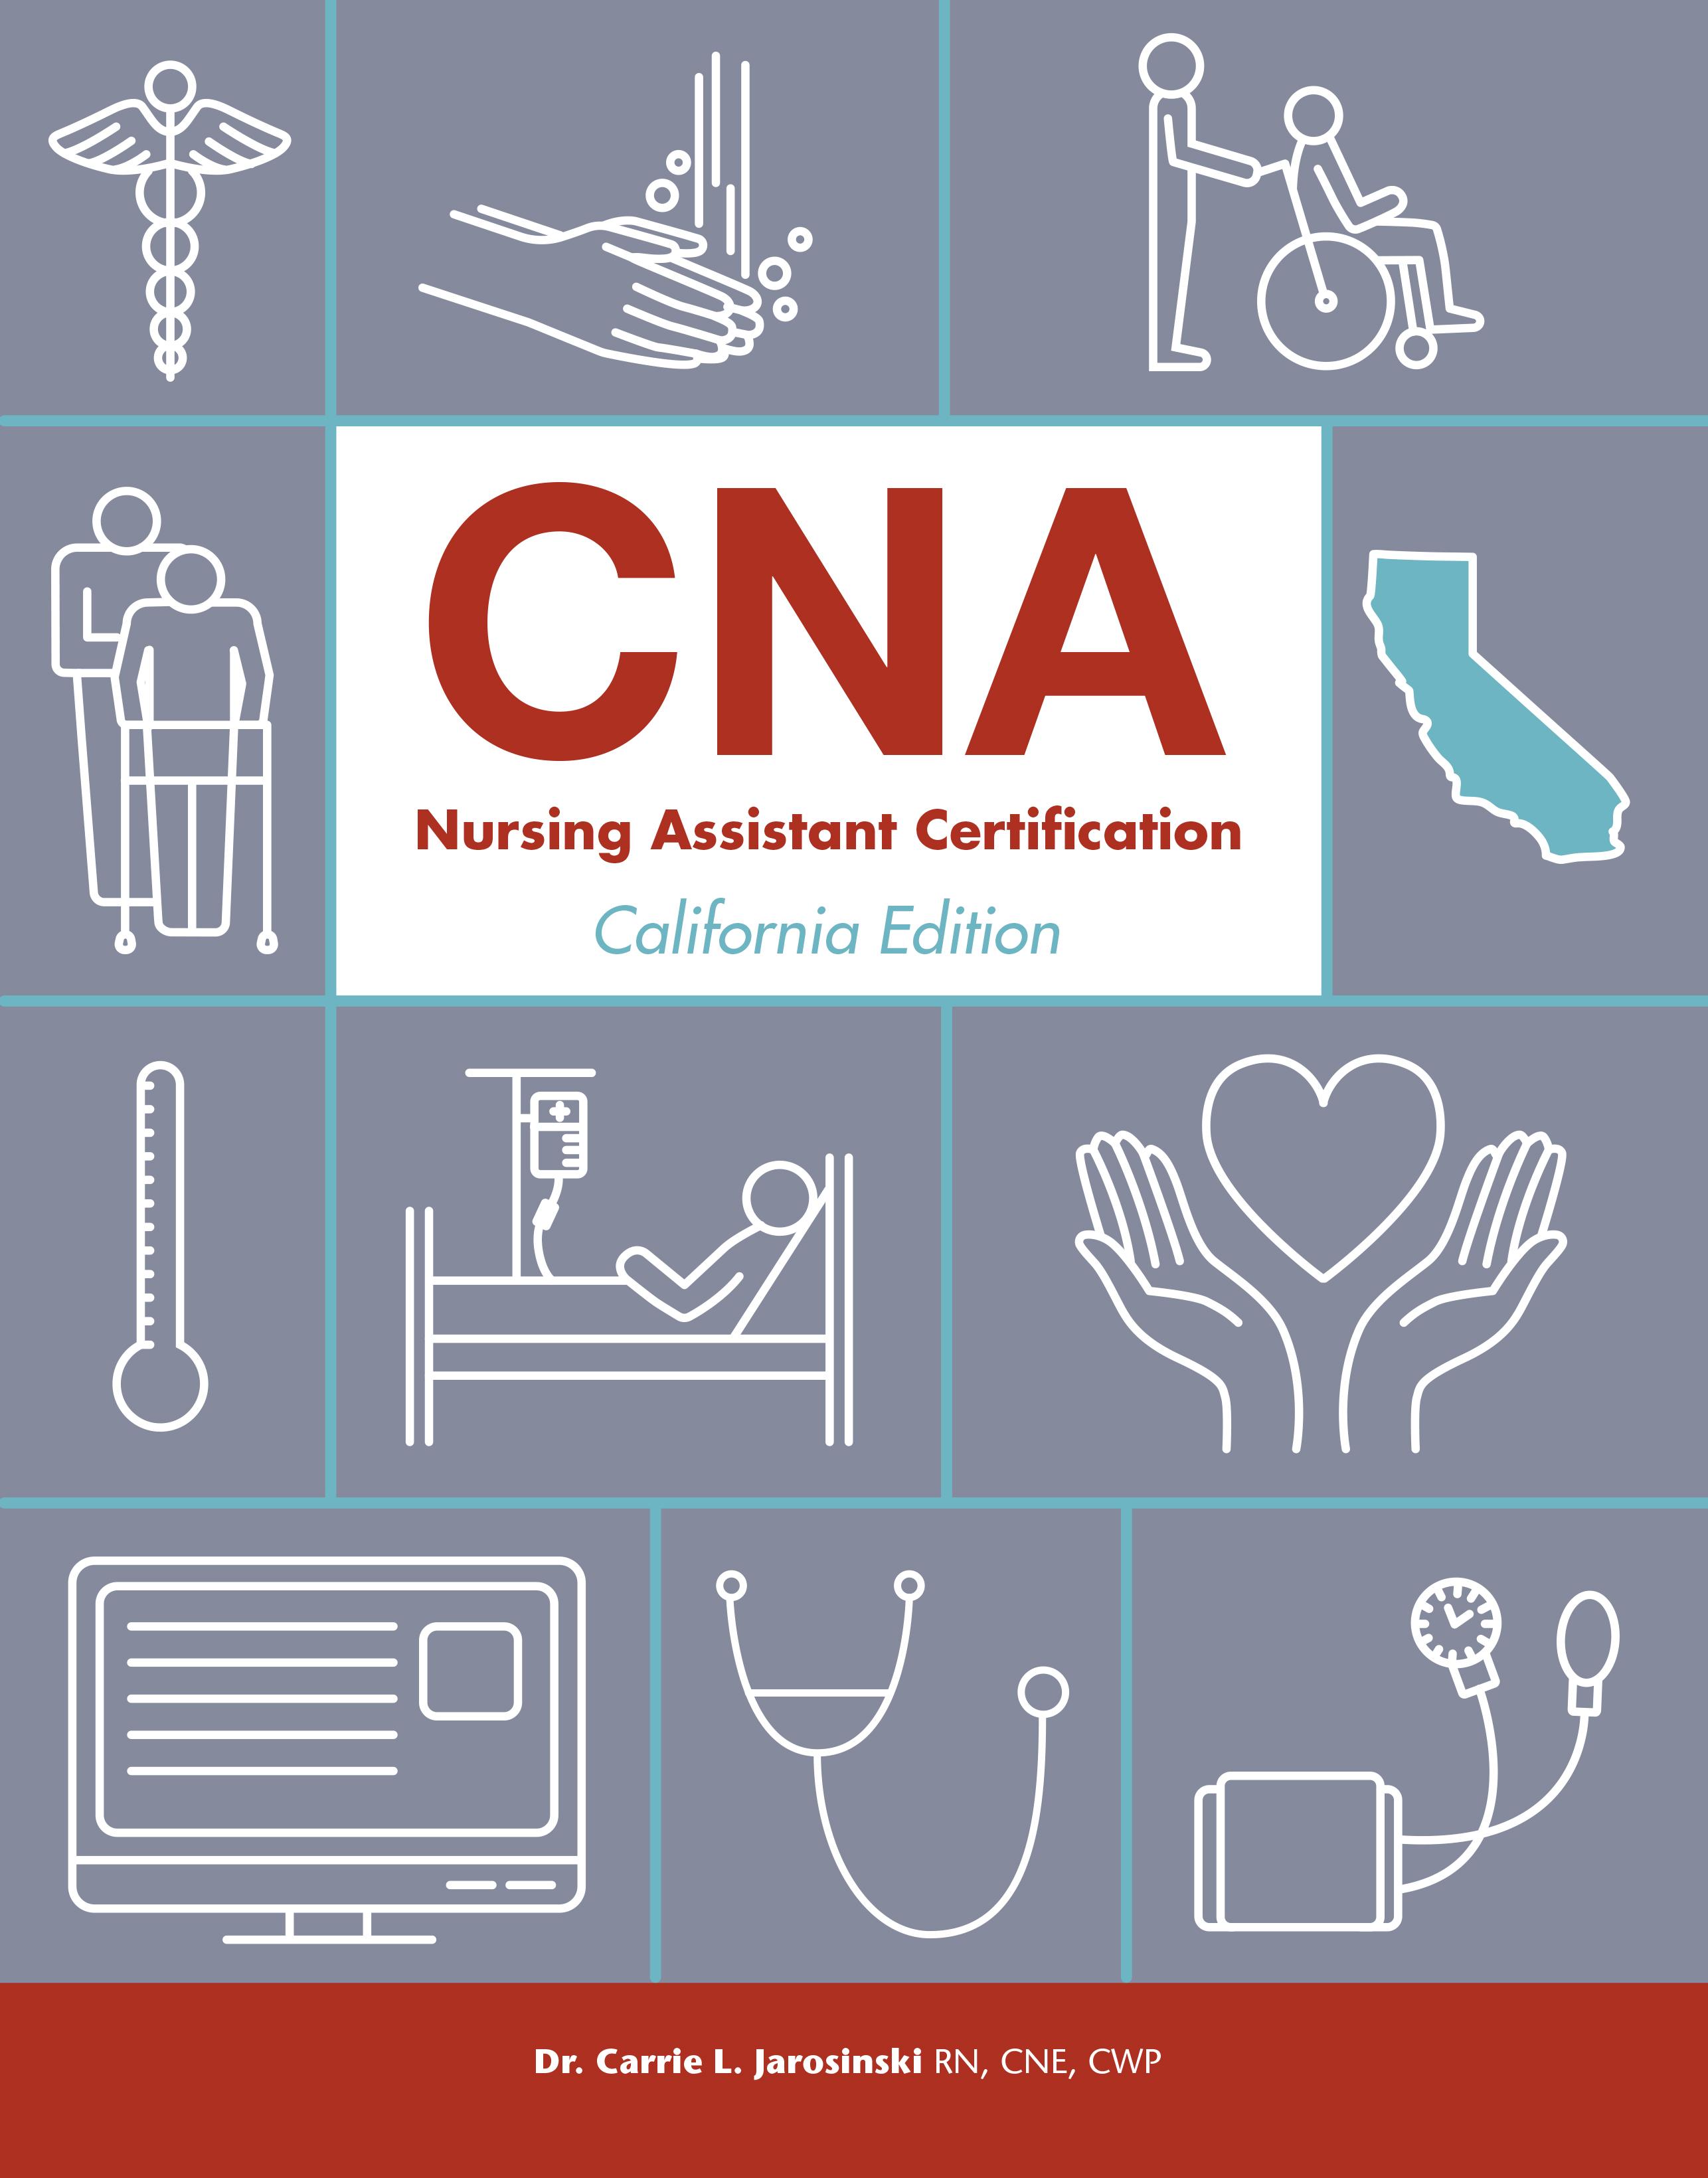 CNA Nursing Assistant Certification, California Edition Textbook